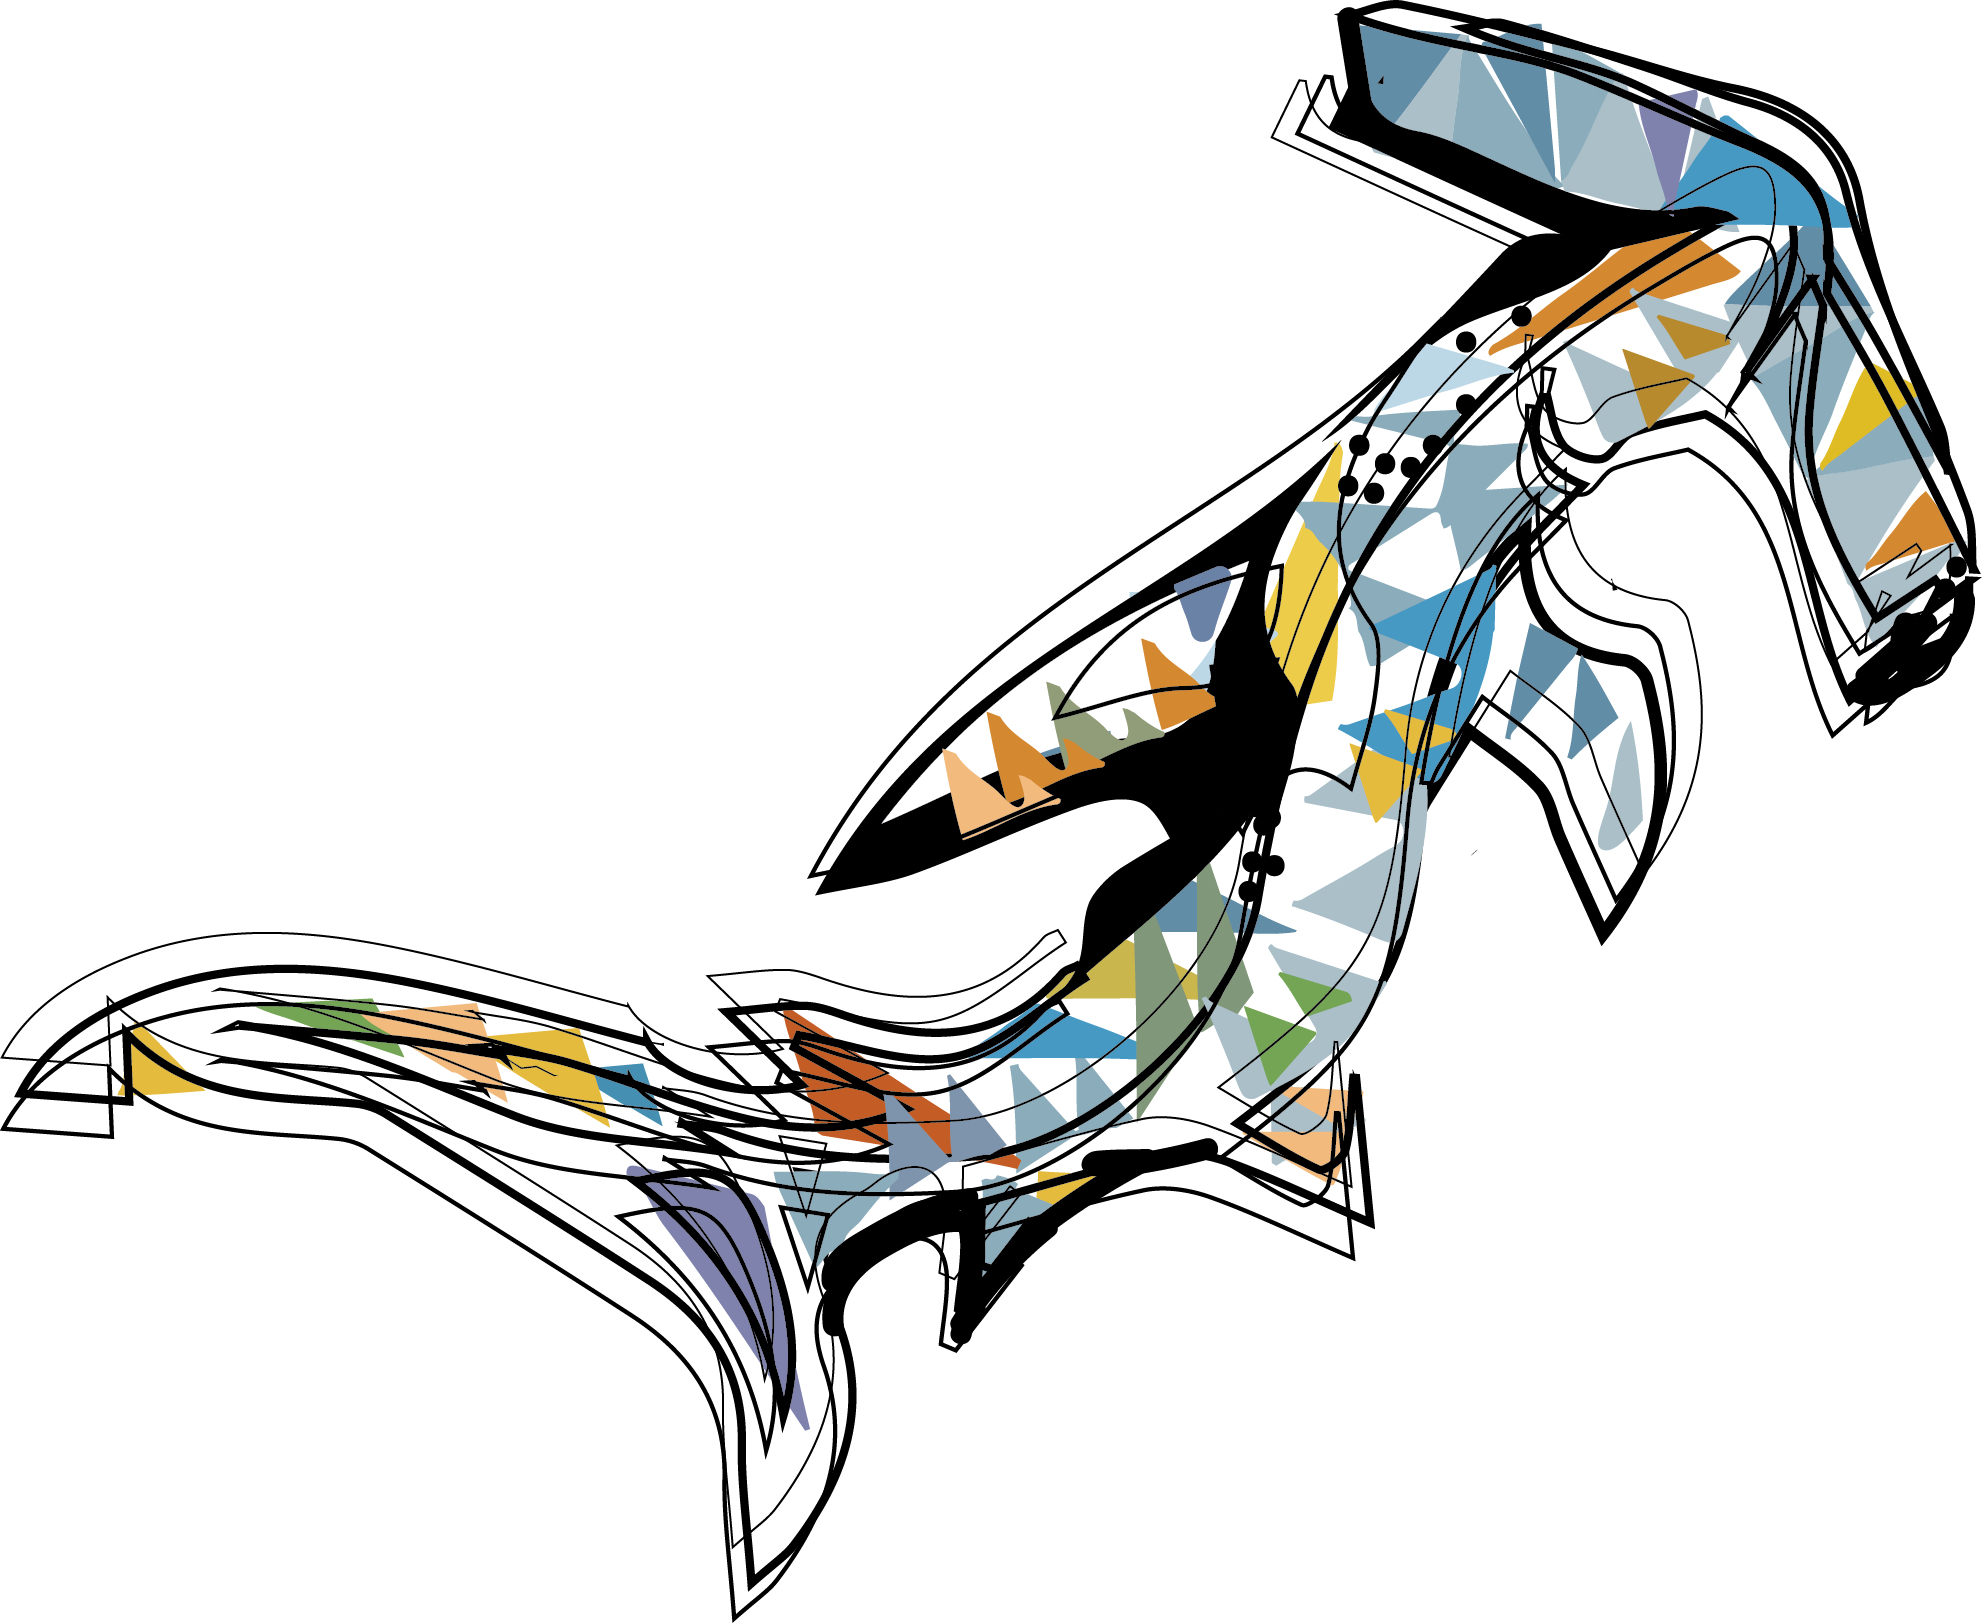 Basking Shark by Christina Ward